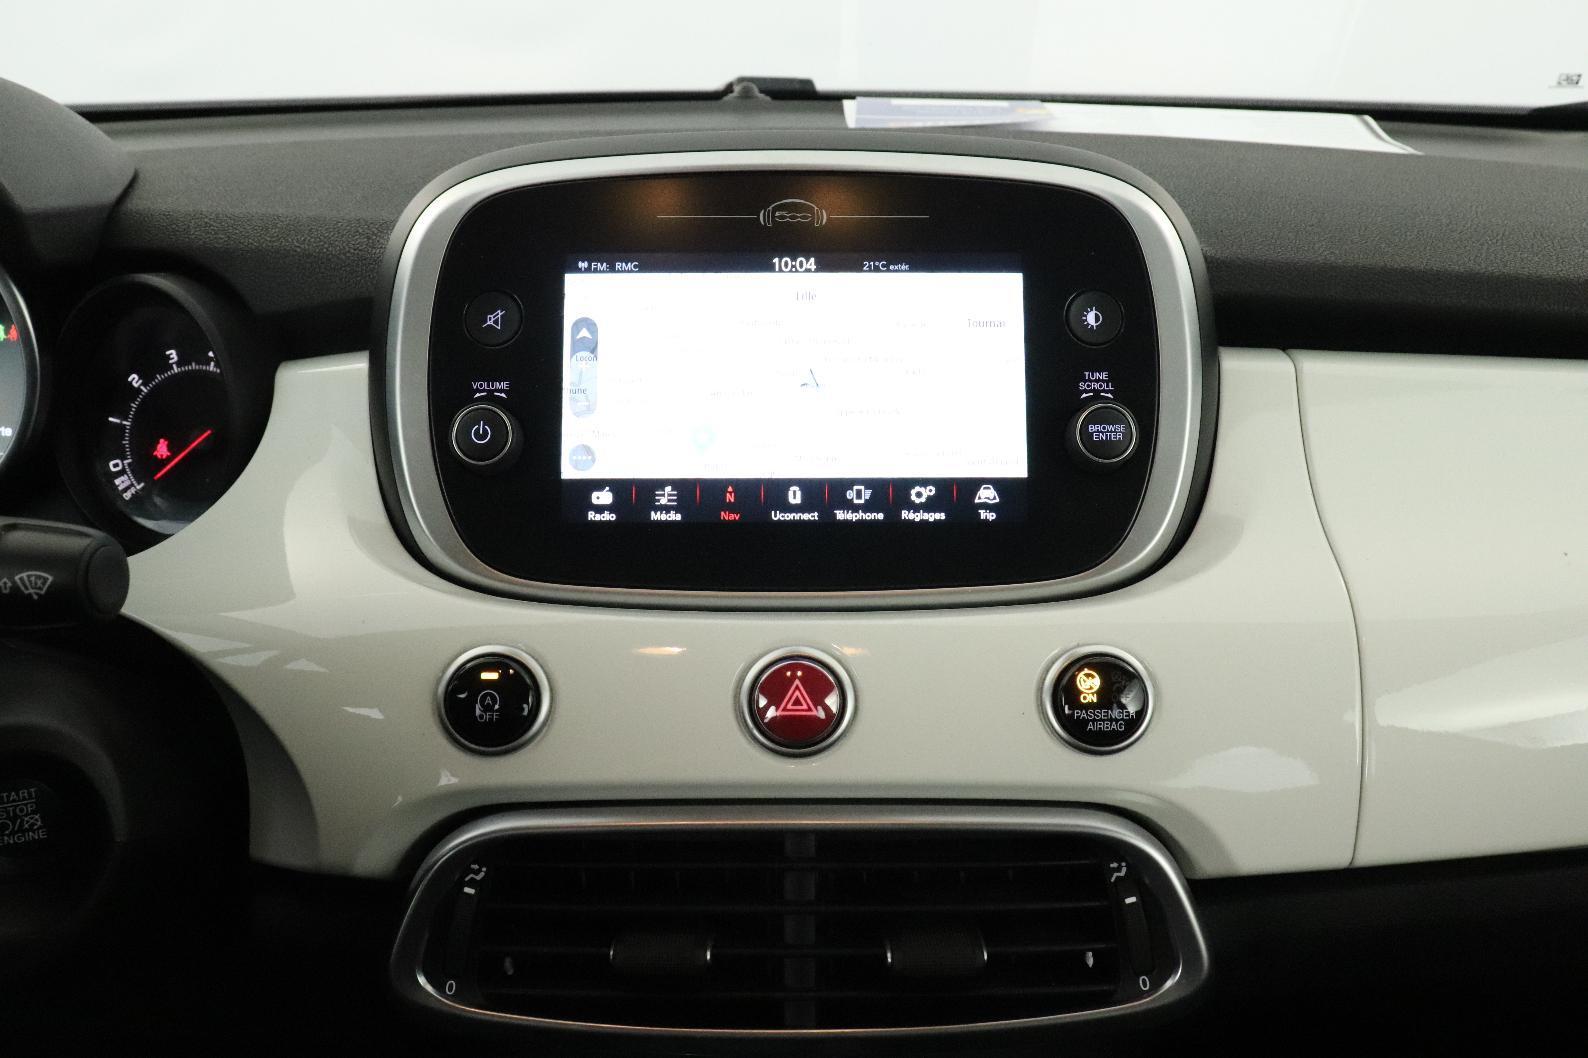 FIAT 500X MY18 500X 1.4 MultiAir 140 ch DCT Lounge